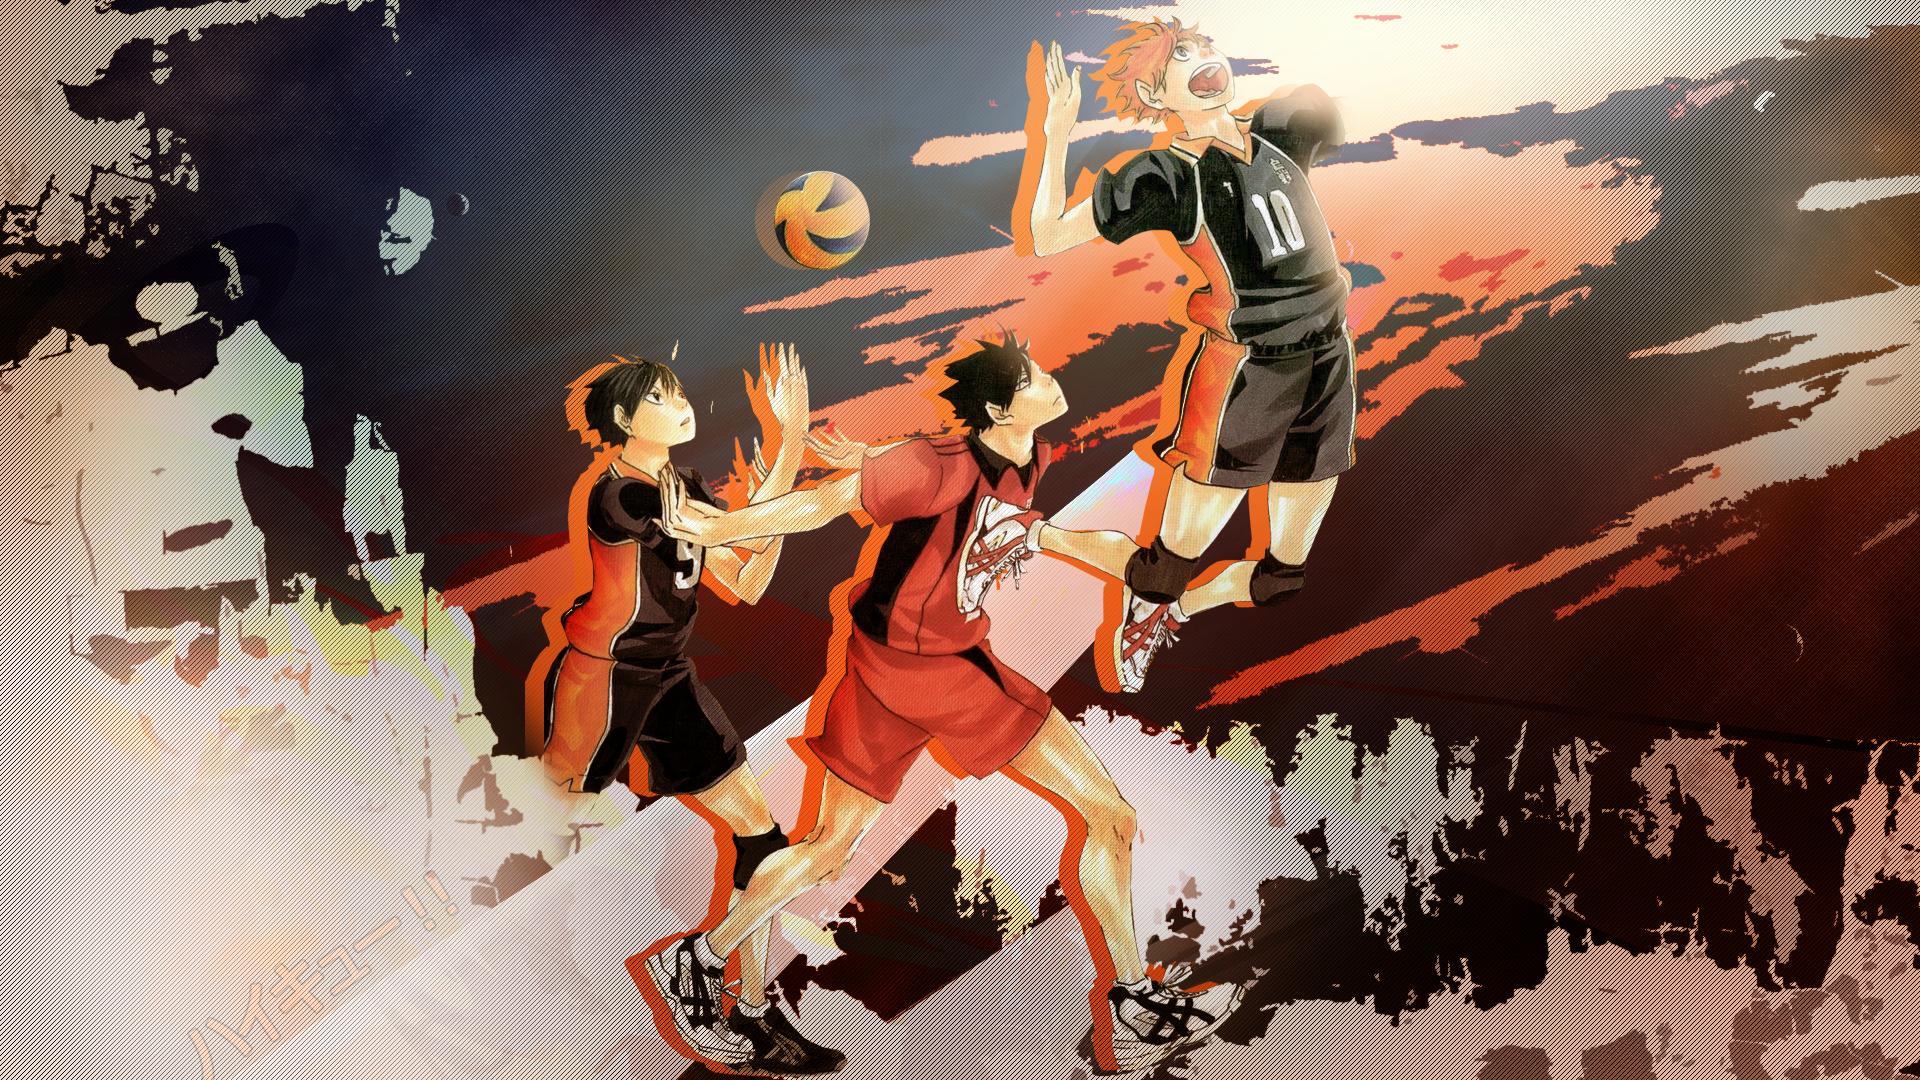 Haikyuu Anime Hd Wallpaper Haikyuu Wallpaper Haikyuu Anime Anime Artwork Wallpaper